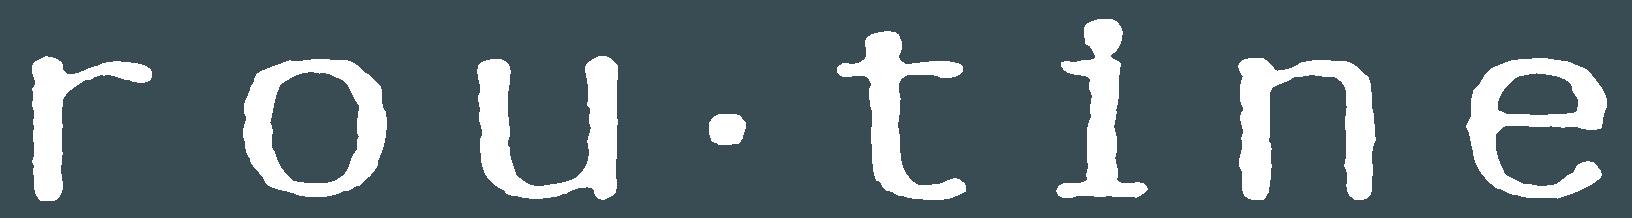 WFshowspage2016R1